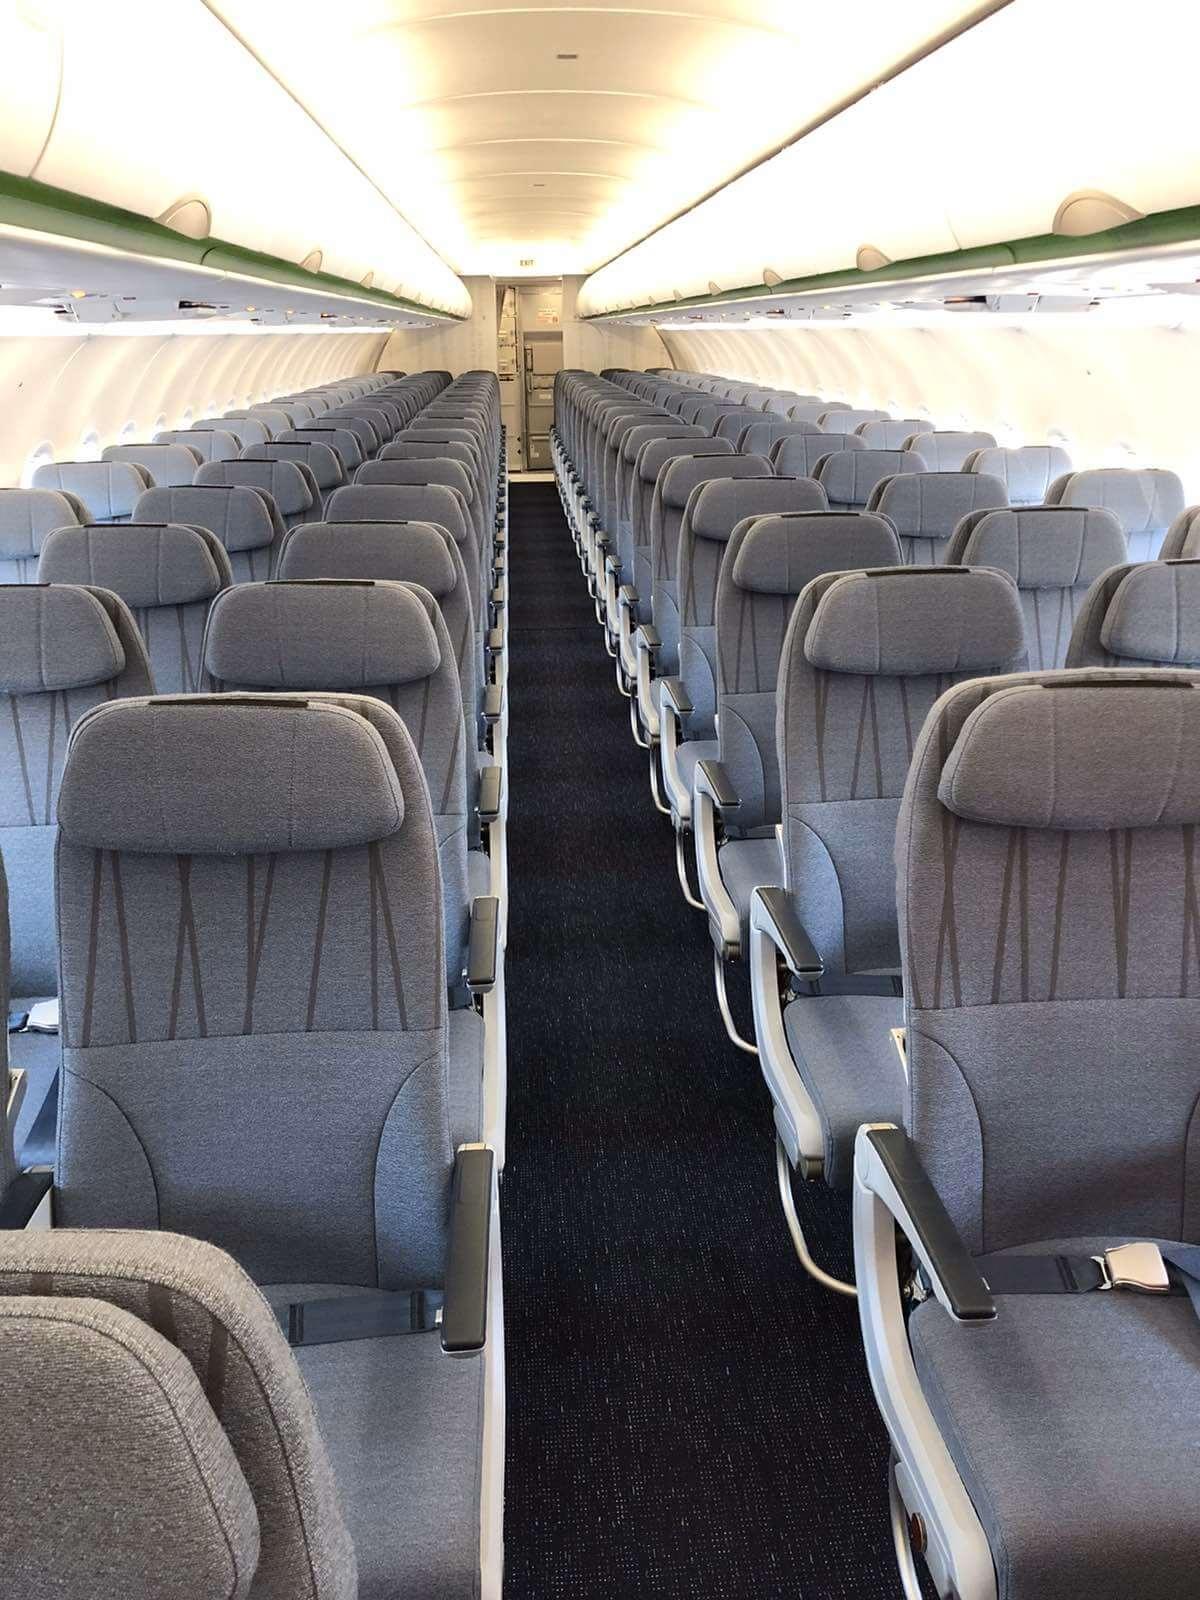 bamboo airways don may bay airbus a320neo